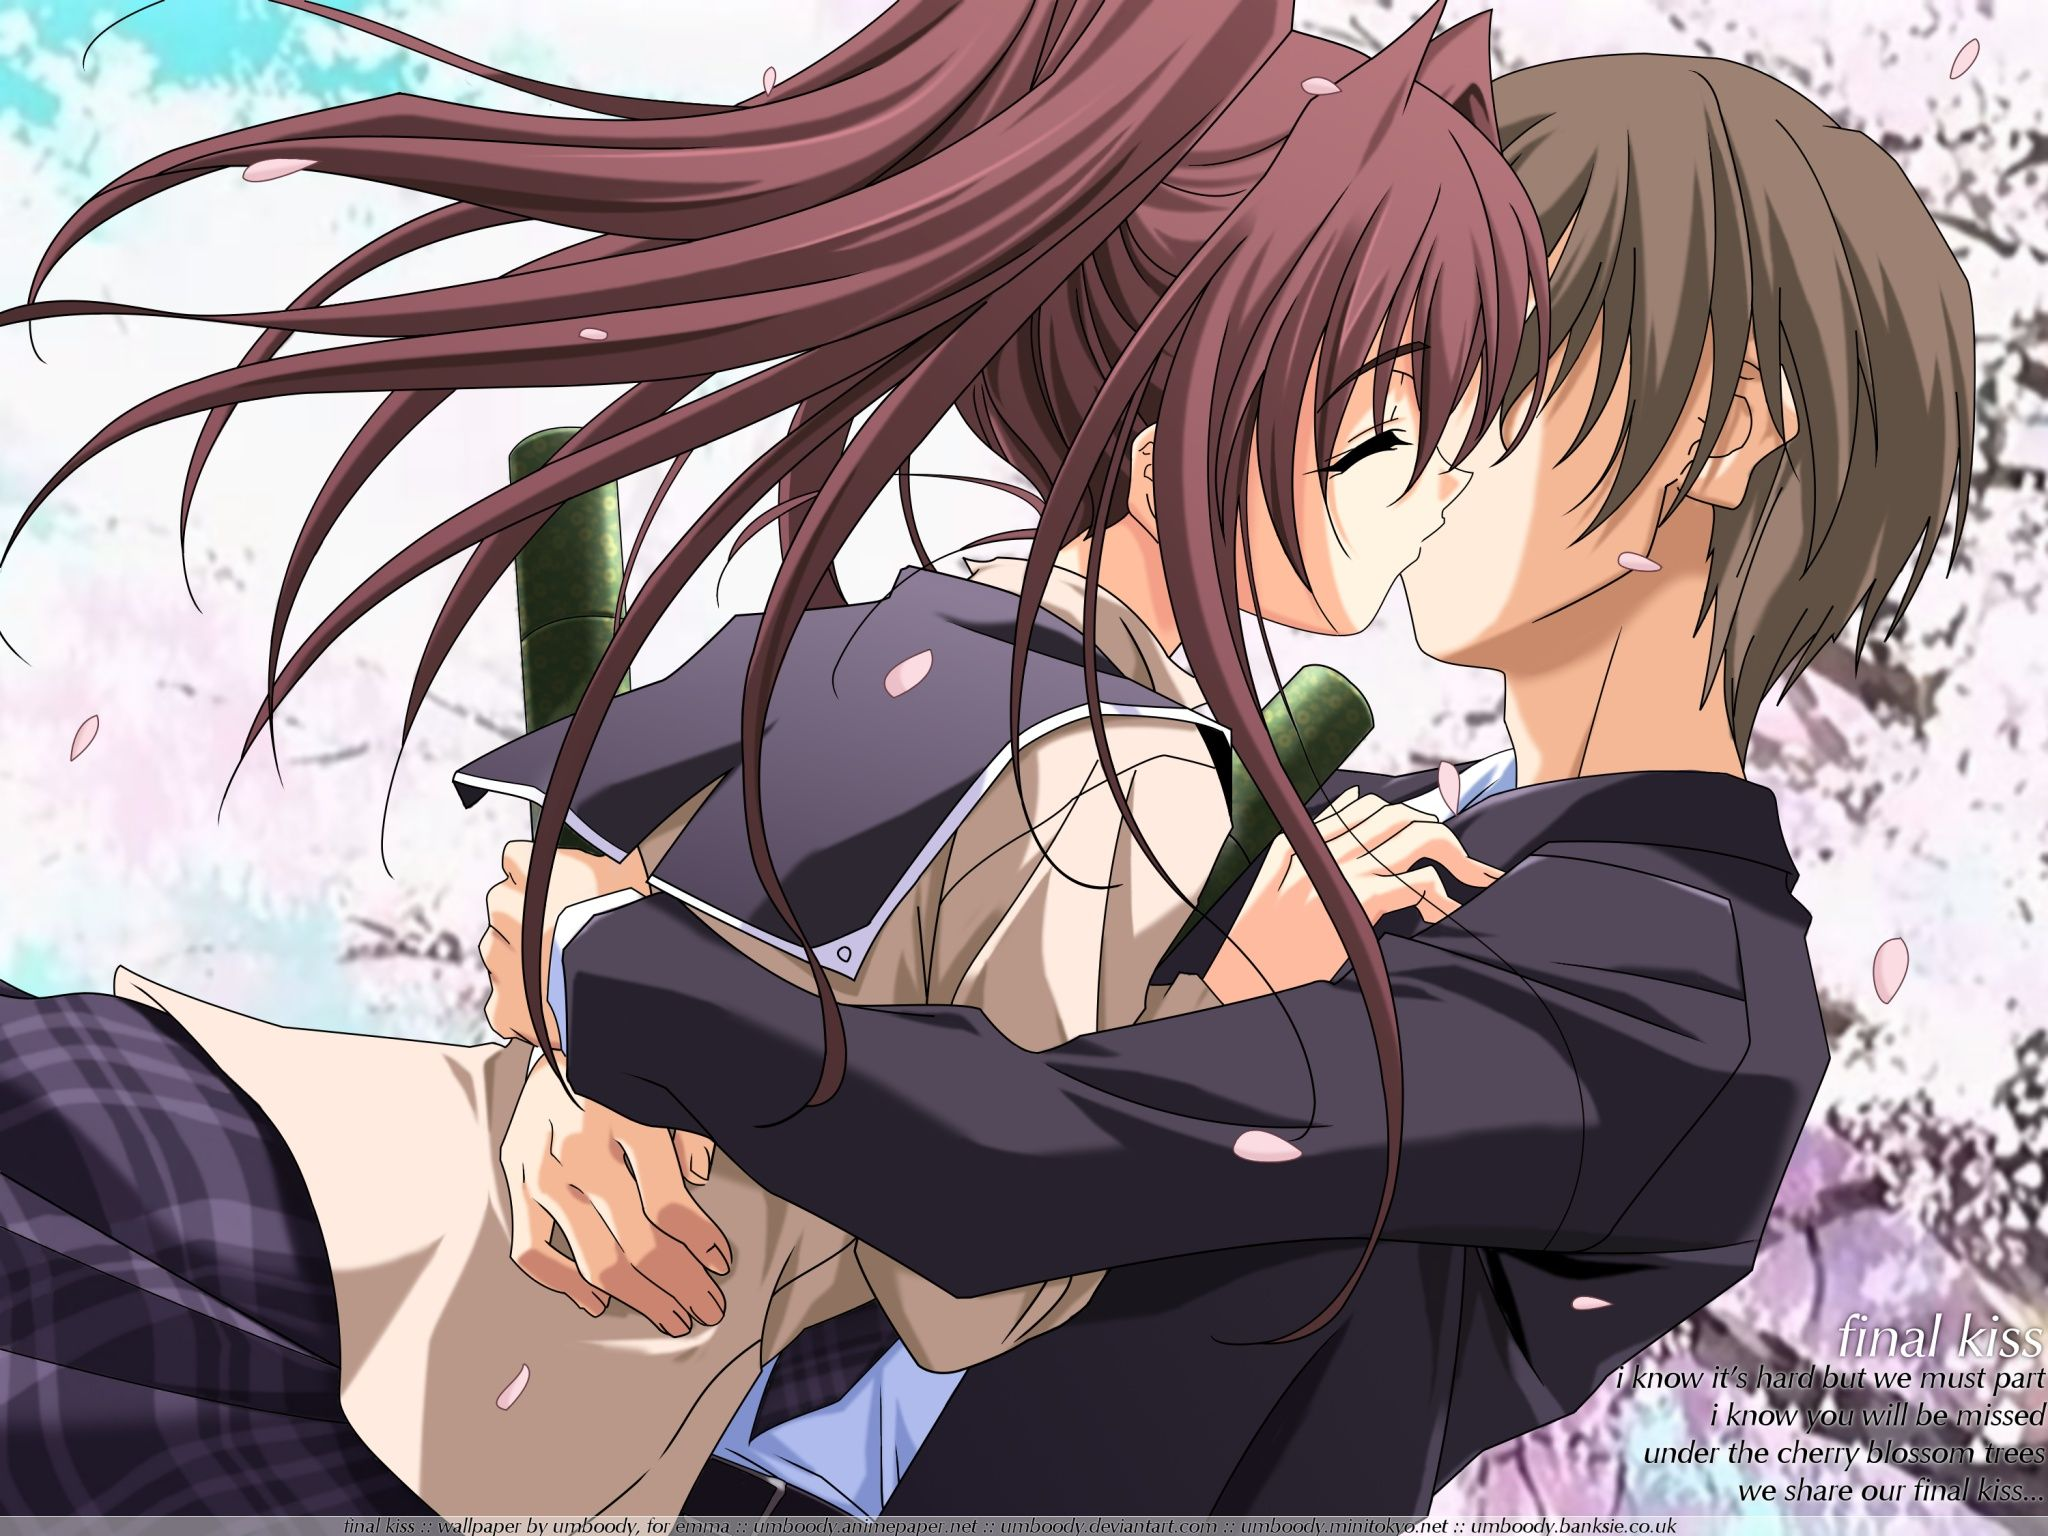 Manga Anime Artwork Best Romance Anime Anime Couple Kiss Anime Artwork Anime kiss best wallpaper